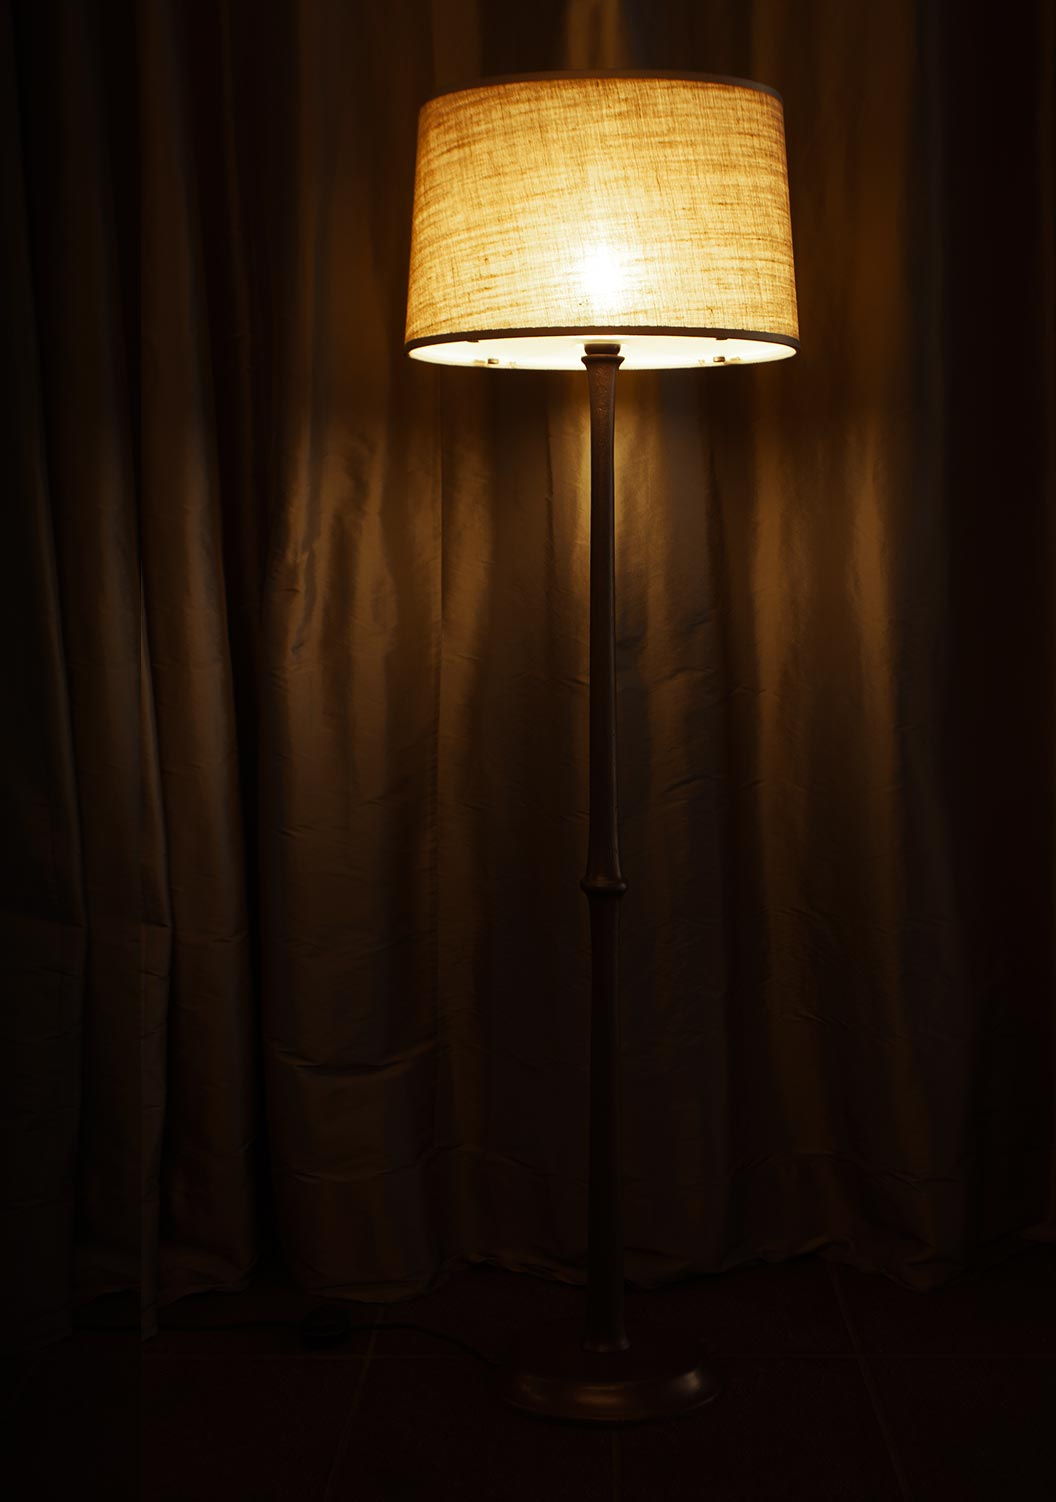 lampen von promemoria. Black Bedroom Furniture Sets. Home Design Ideas